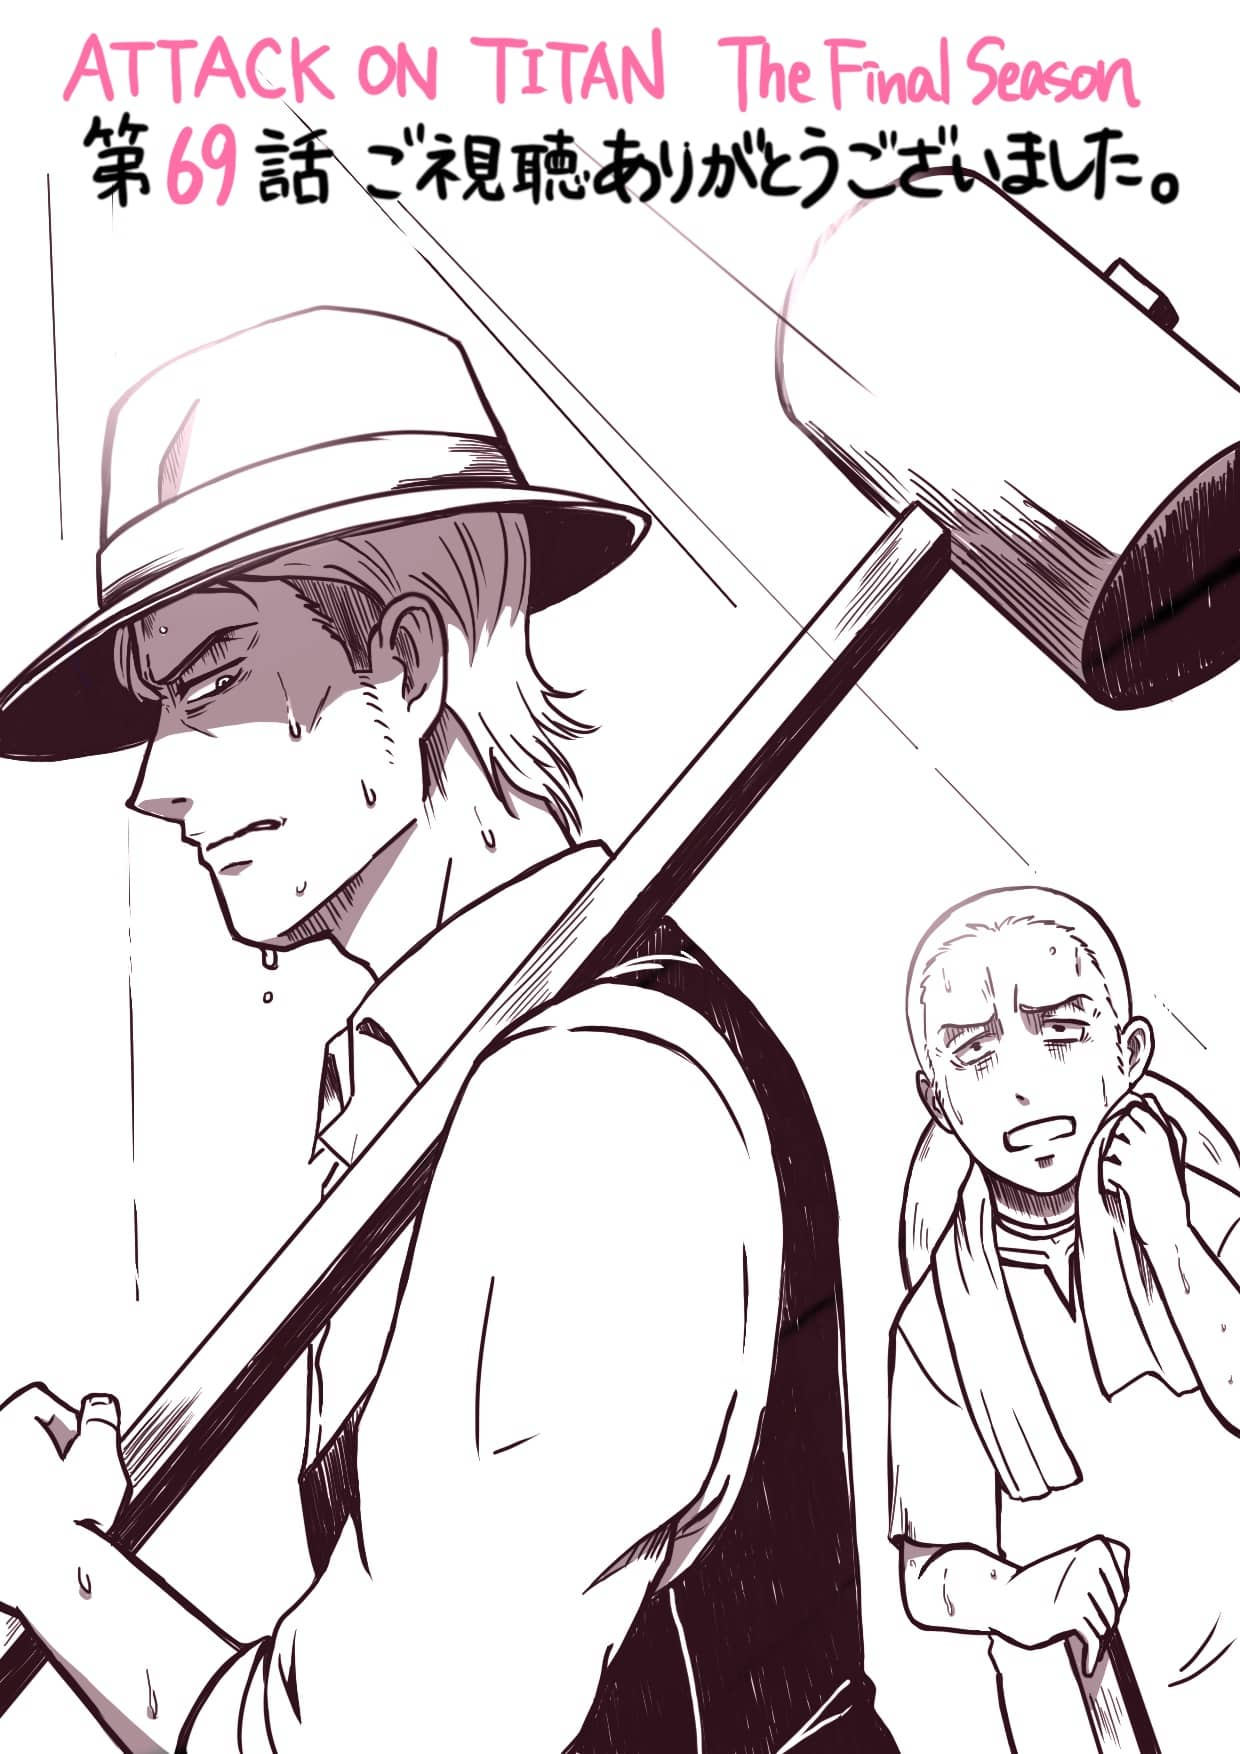 Shingeki no Kyojin ilustracion decimo episodio